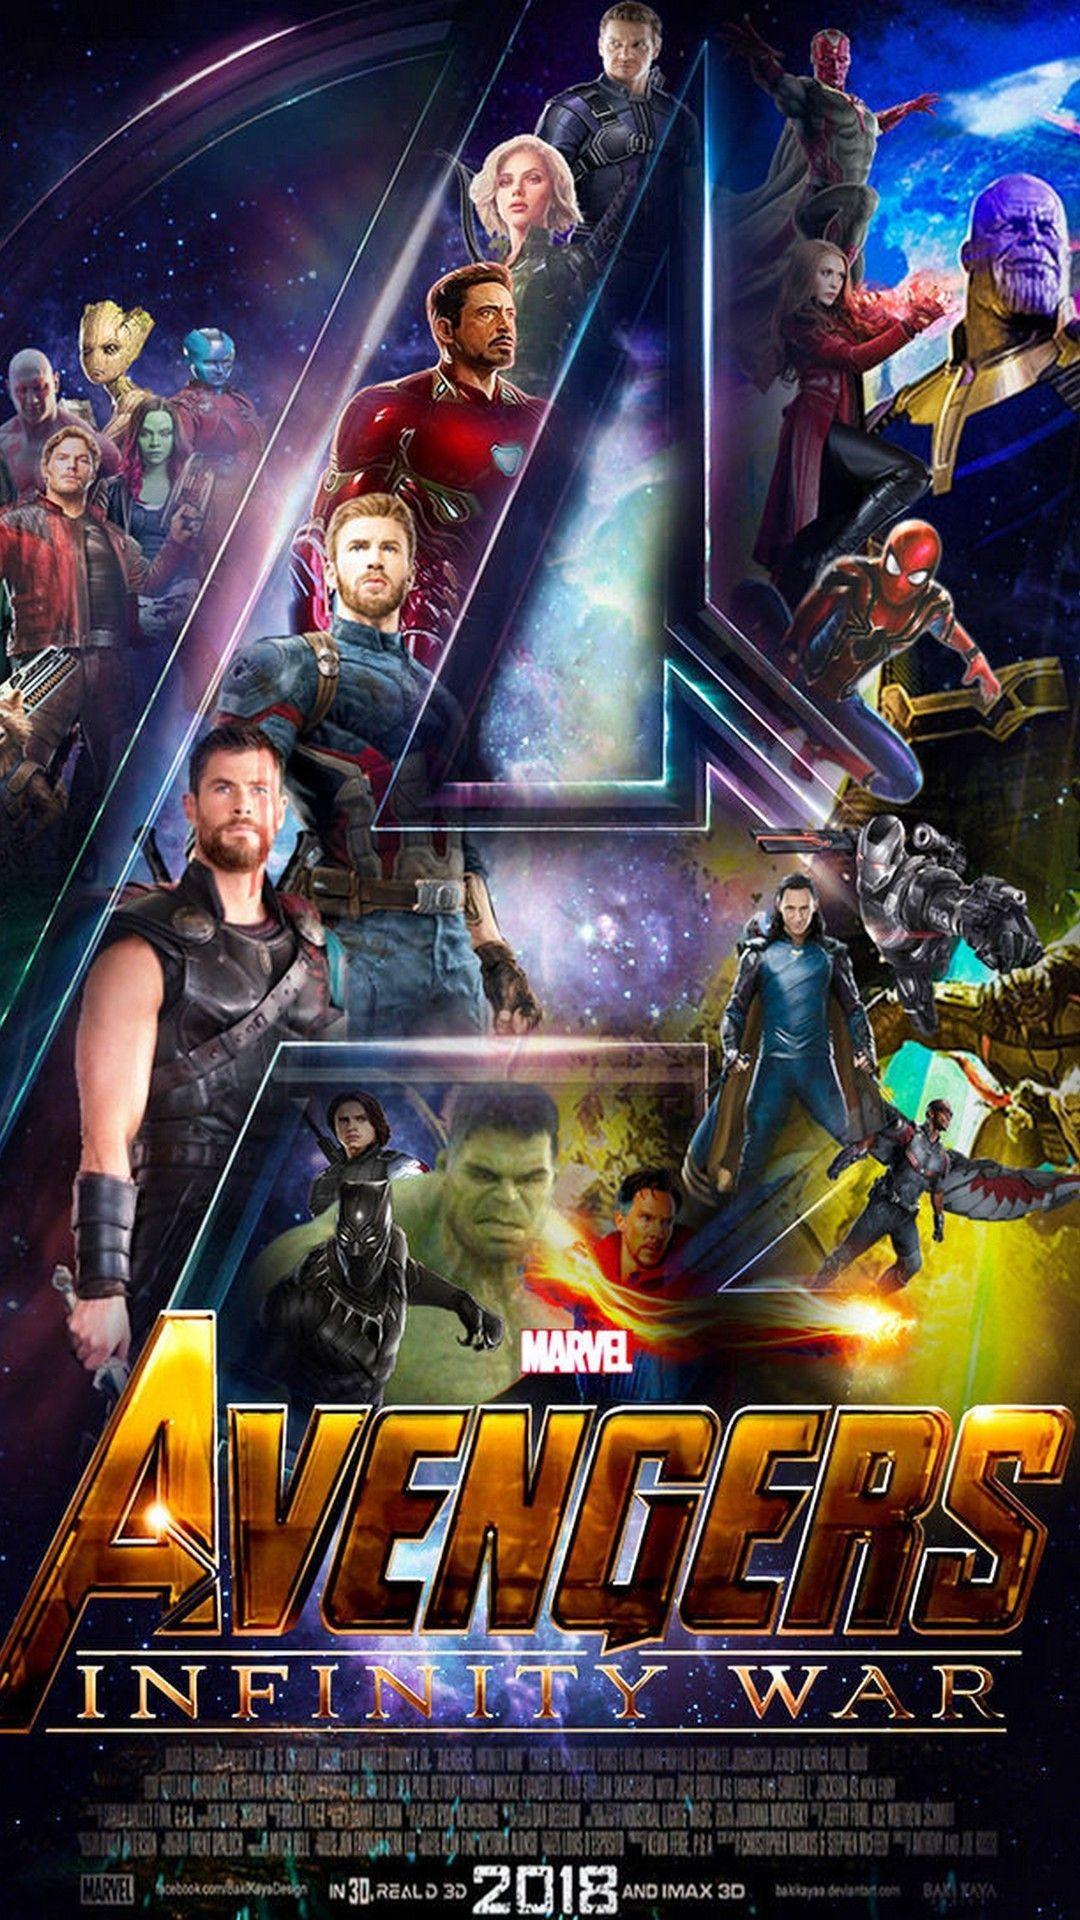 Ultimate Avengers Infinity War Wallpaper In K By Boomart On